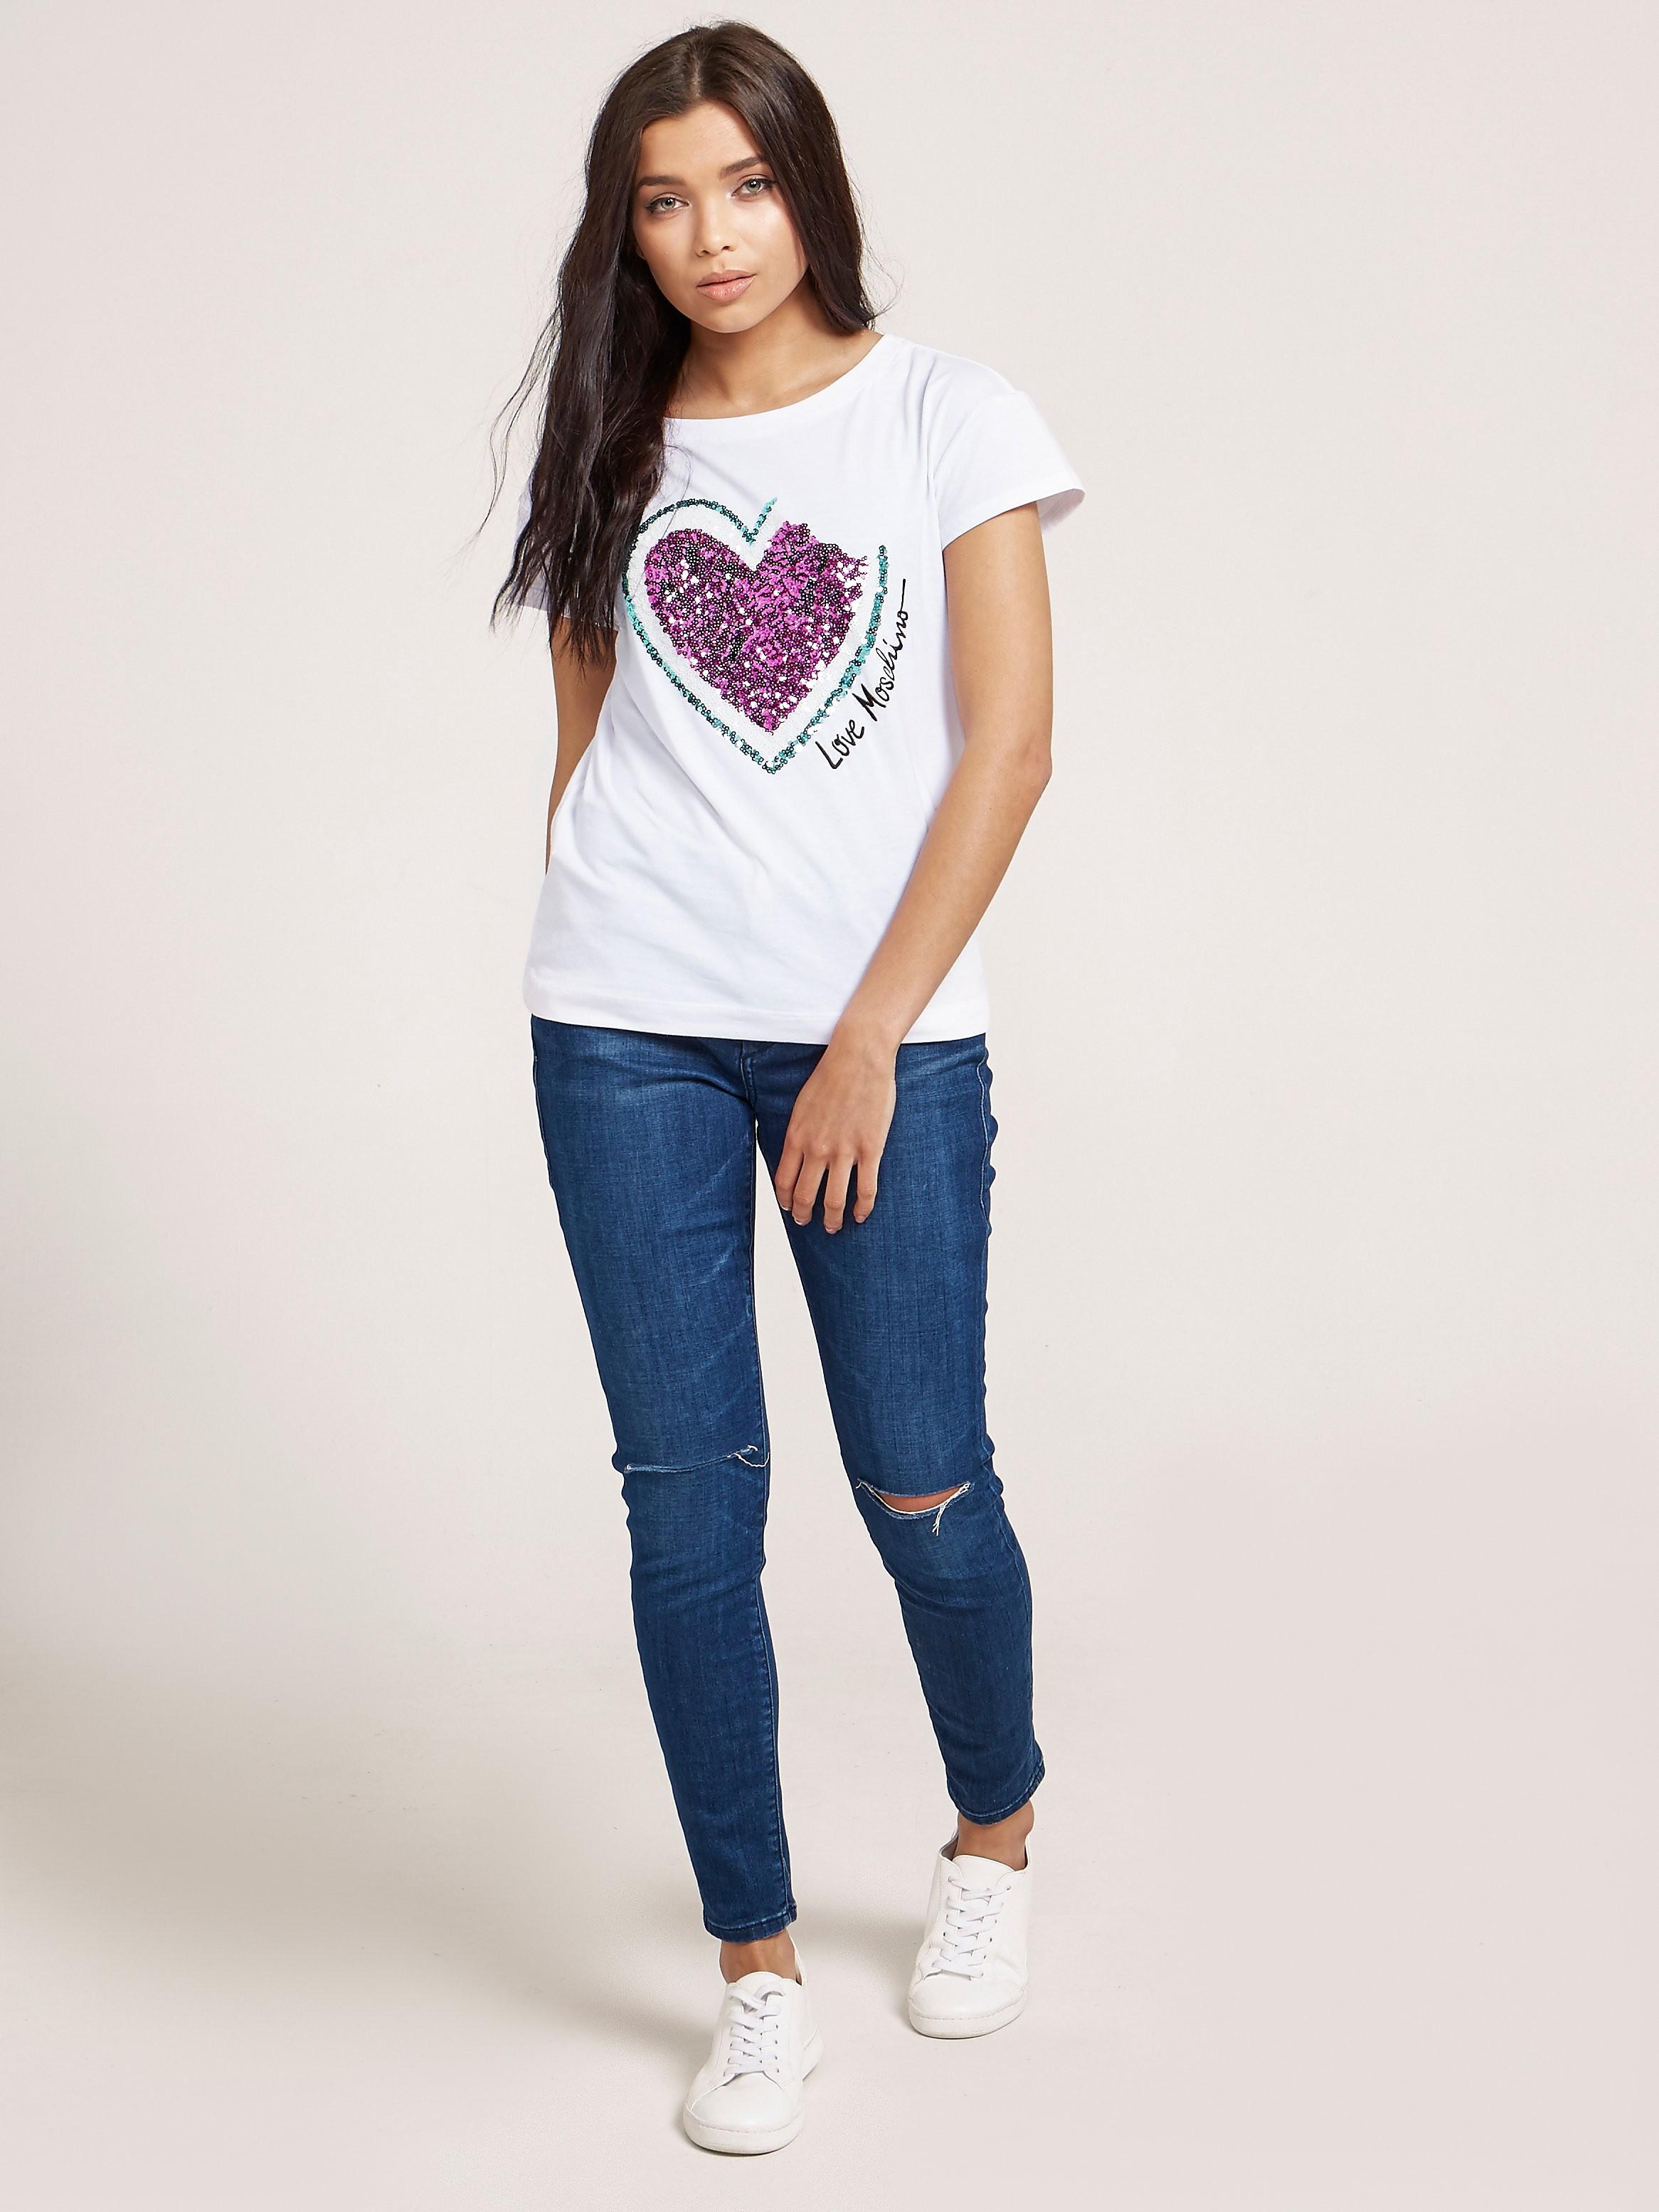 Love Moschino Watermelon Sequin T-Shirt